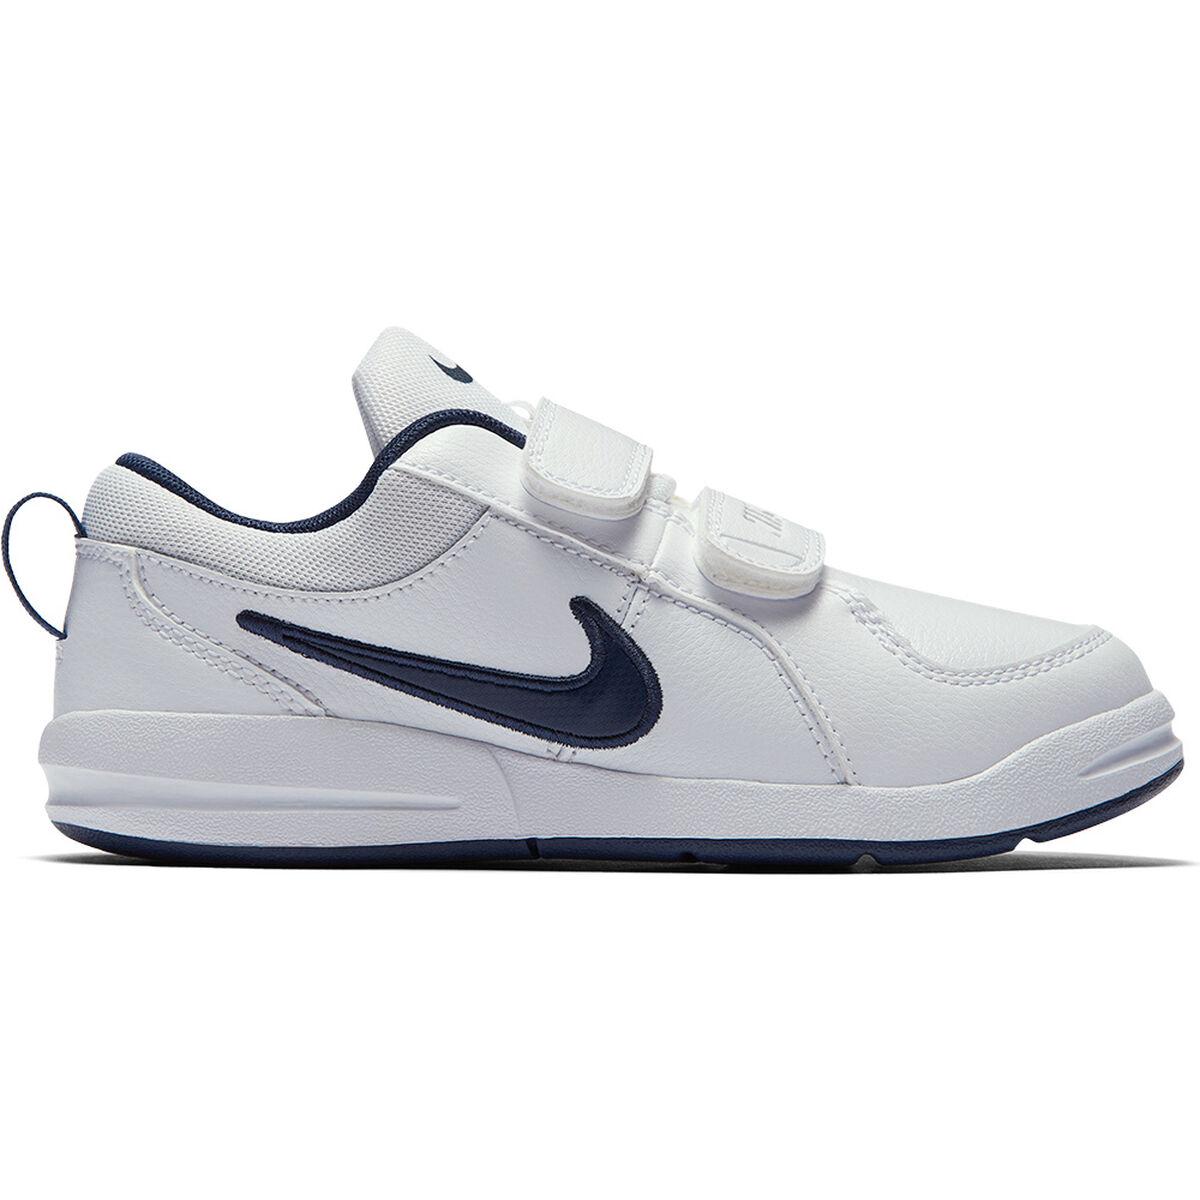 Zapatilla Niño Nike Urbano 454500-101